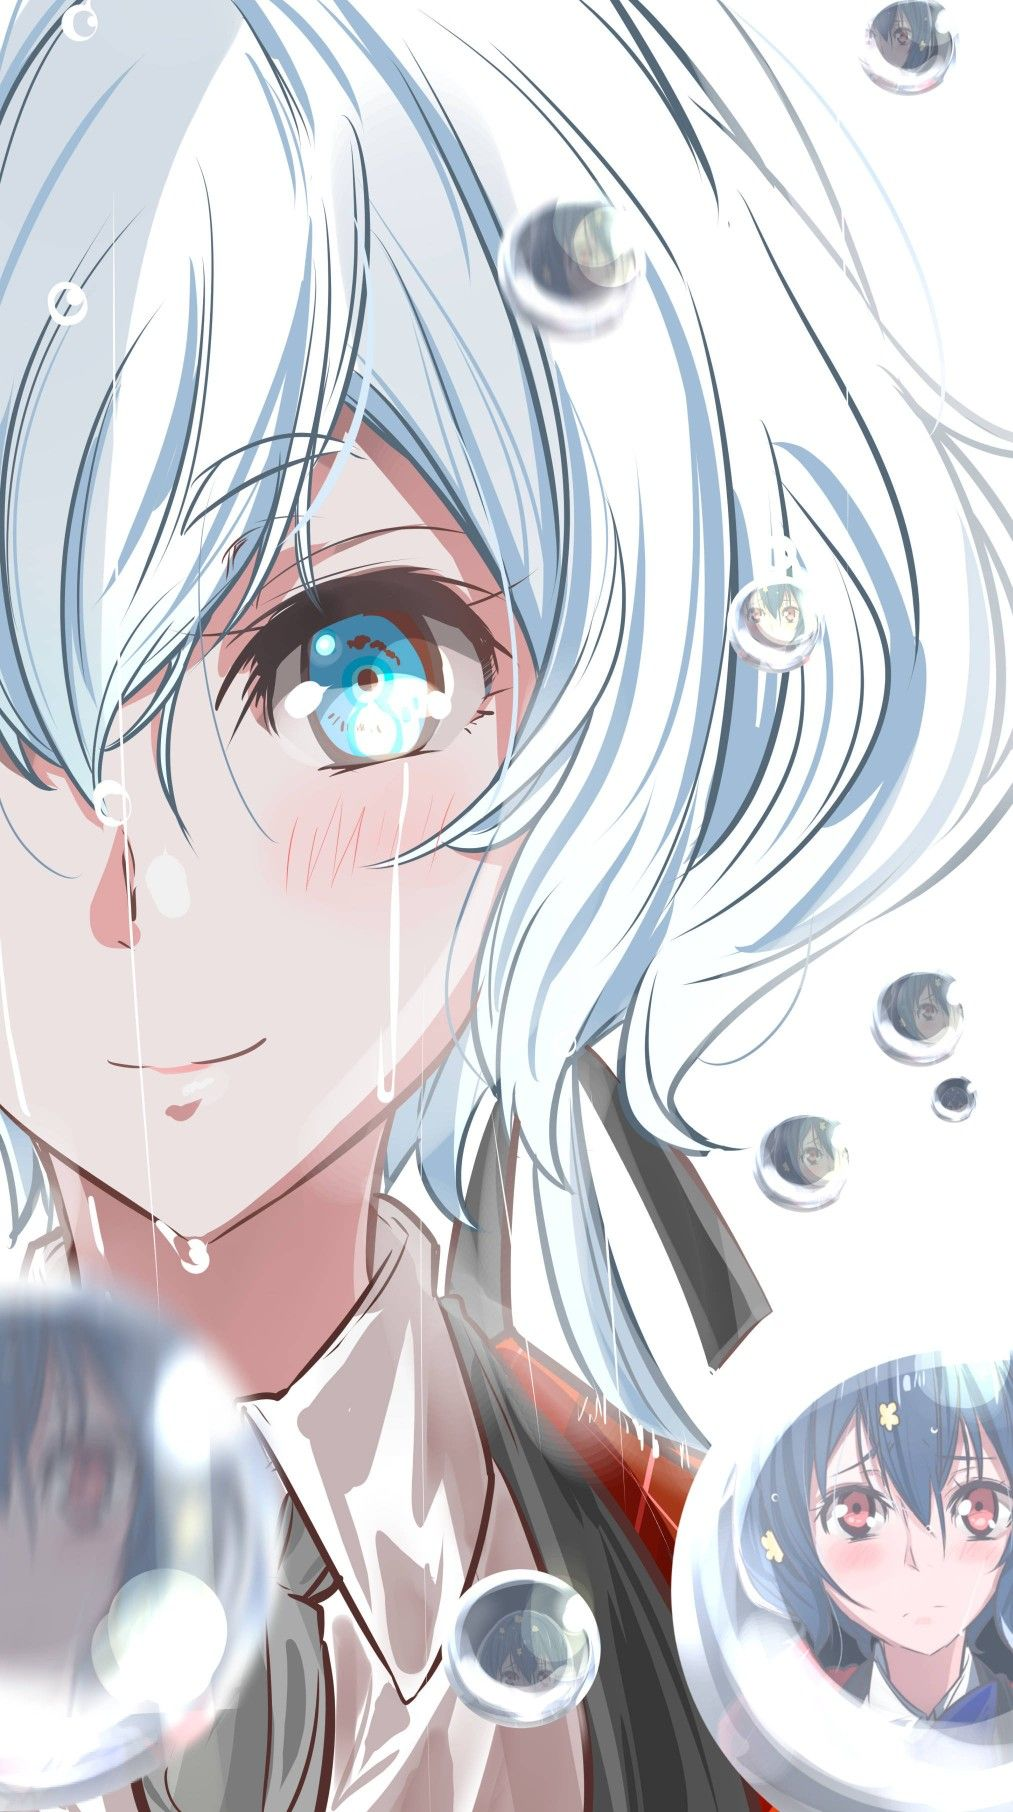 Dp Maternity Black Crinkle Shirt Anime Anime Artwork Anime Eyes